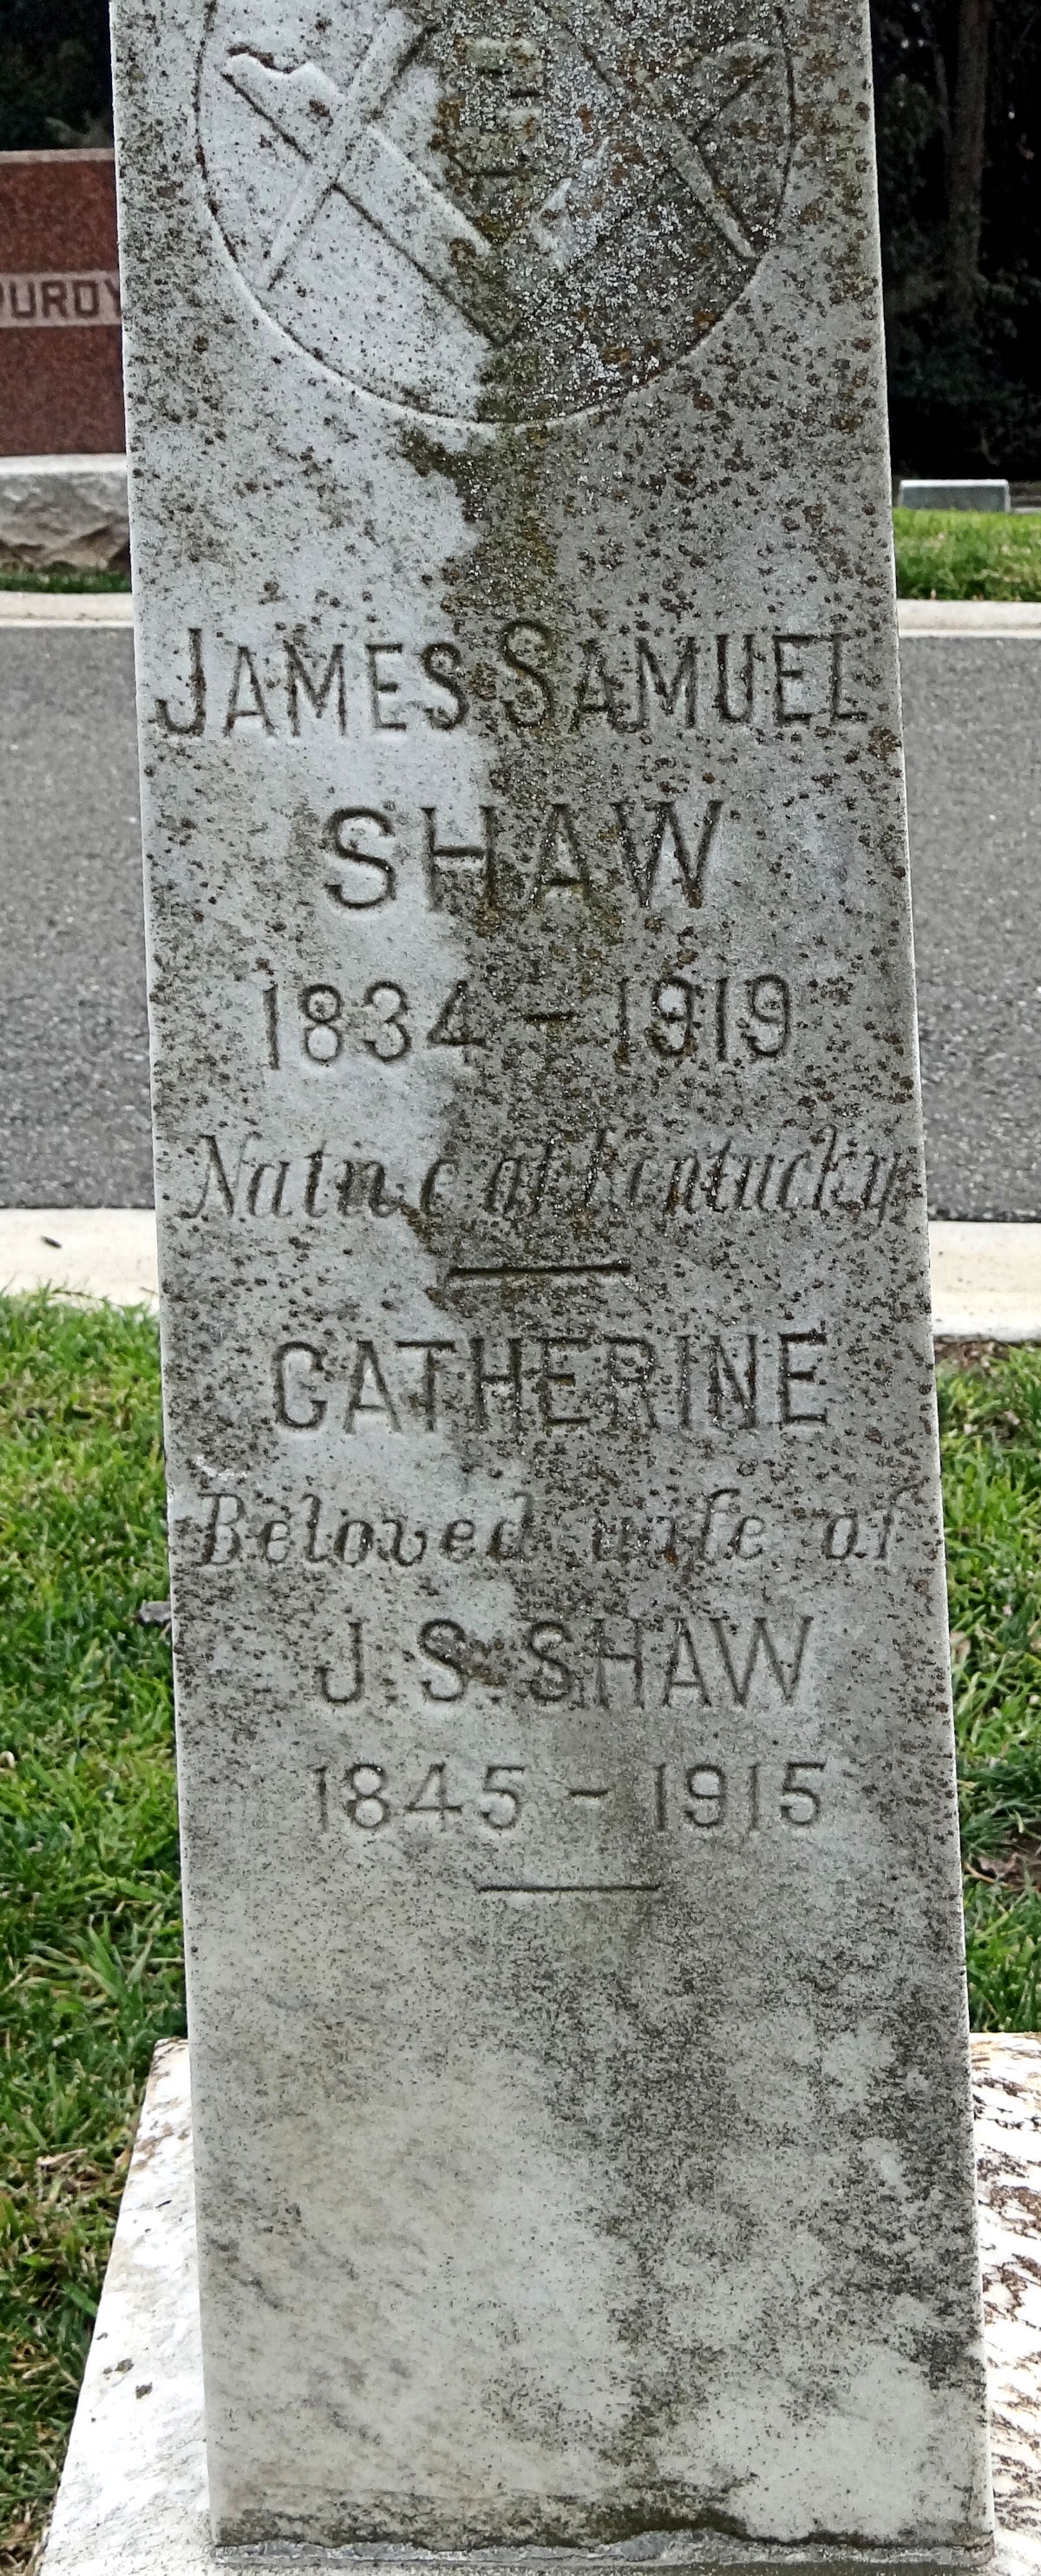 James Samuel Shaw